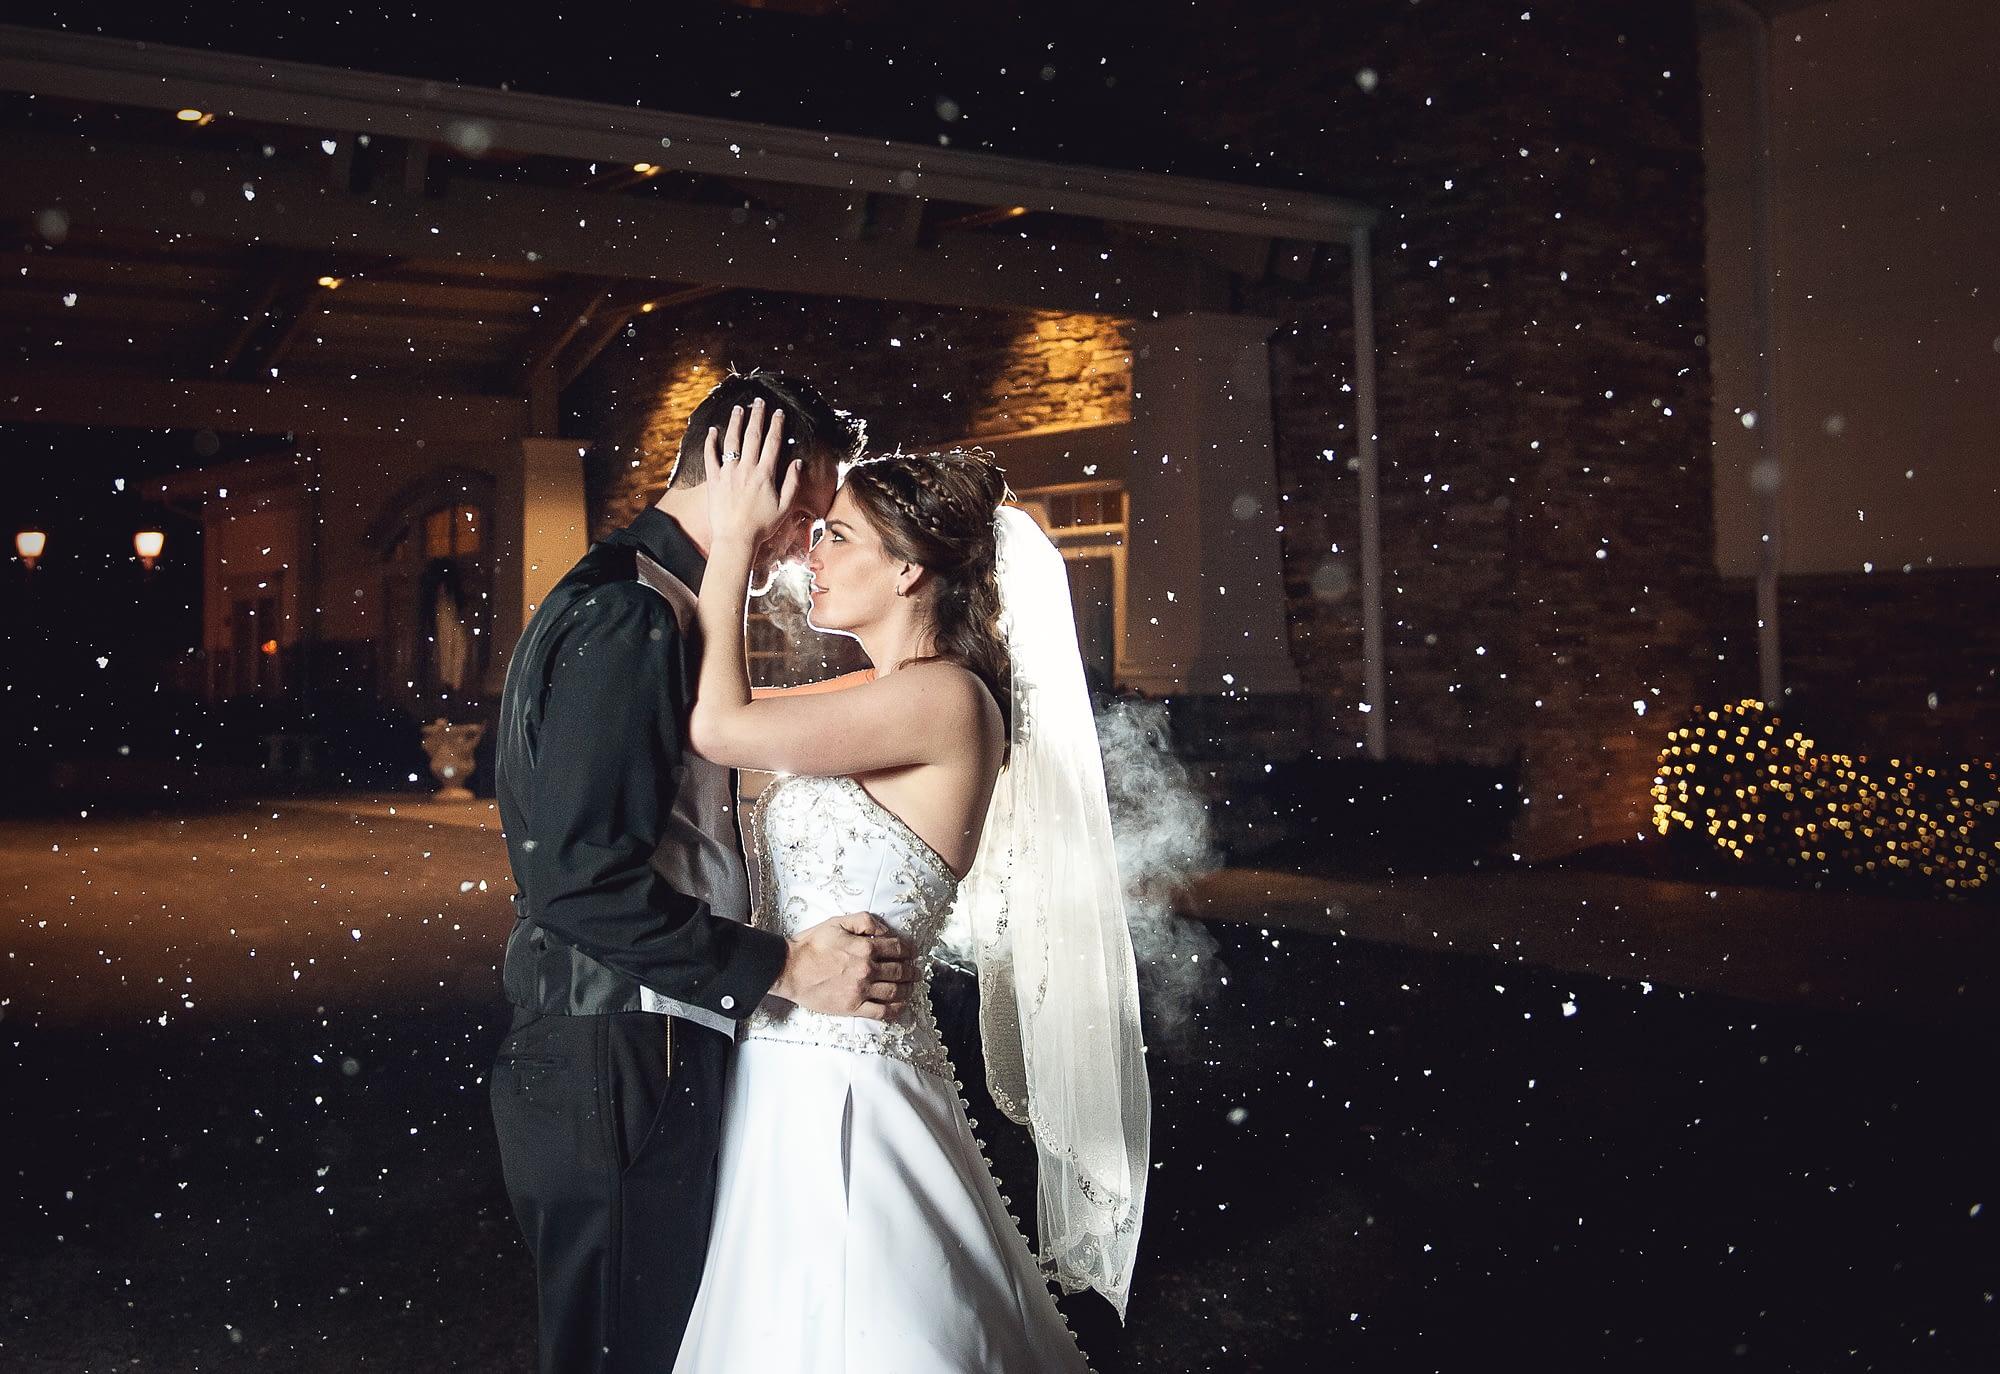 Winter New Years Eve Wedding | Riverview wedding | Simsbury CT Wedding Photographer